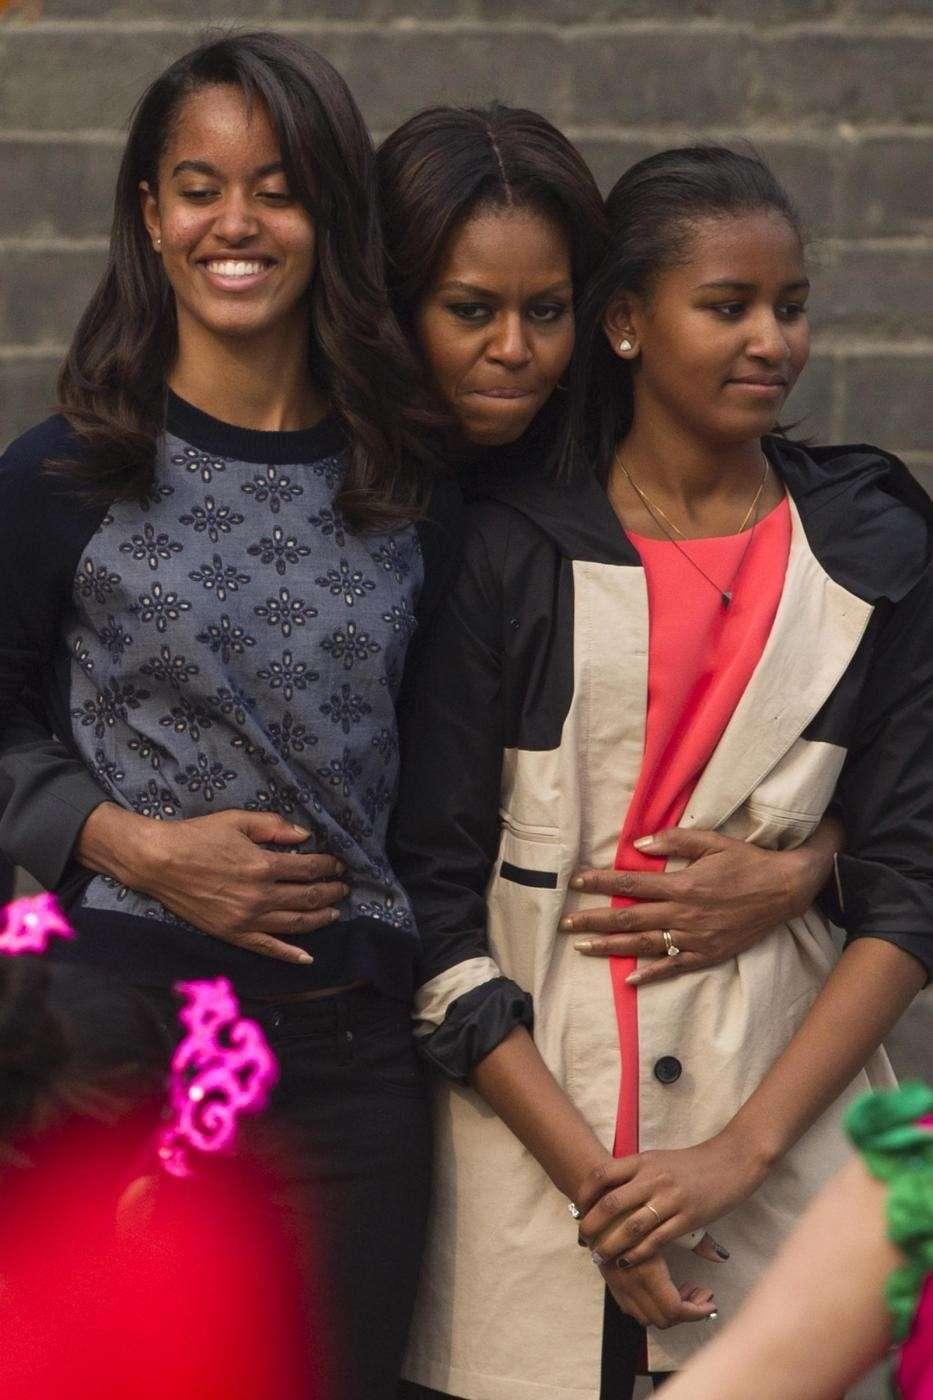 2. Sasha e Malia Obama